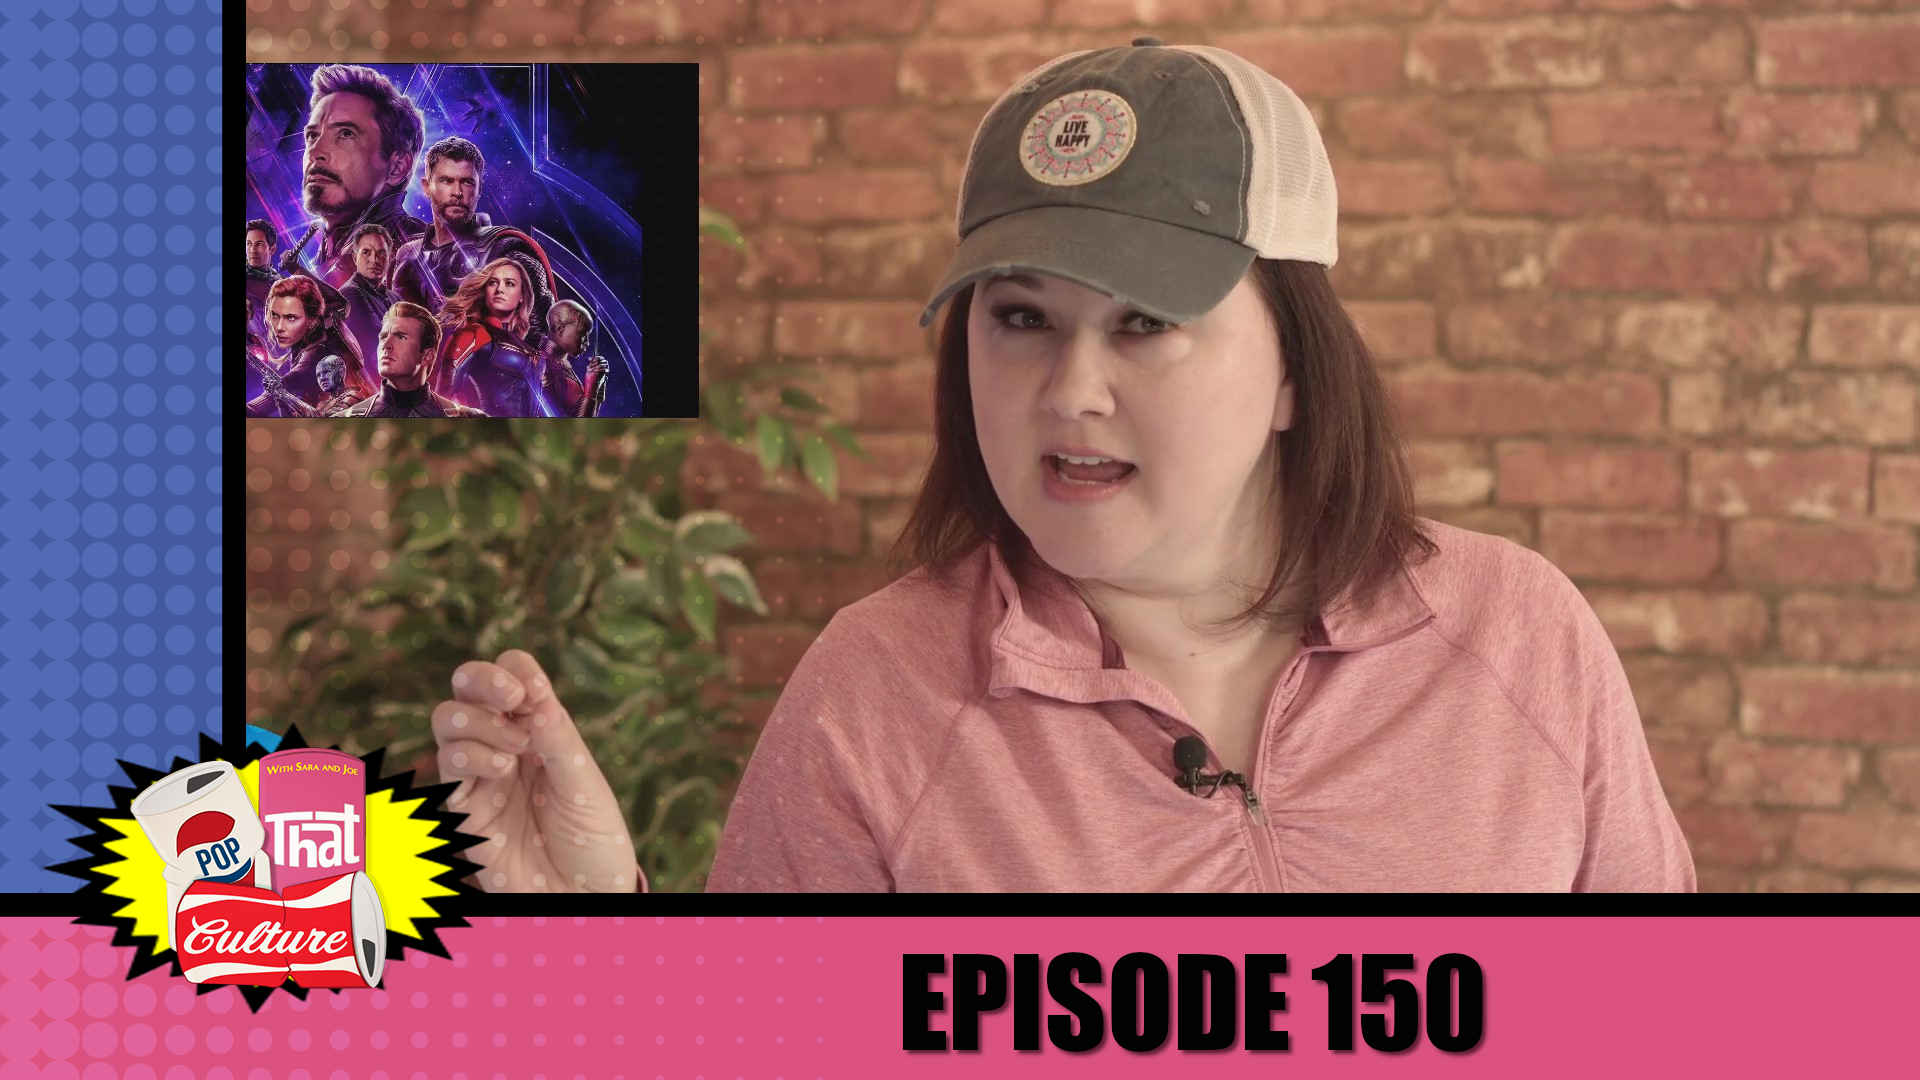 Pop That Culture - Episode 150